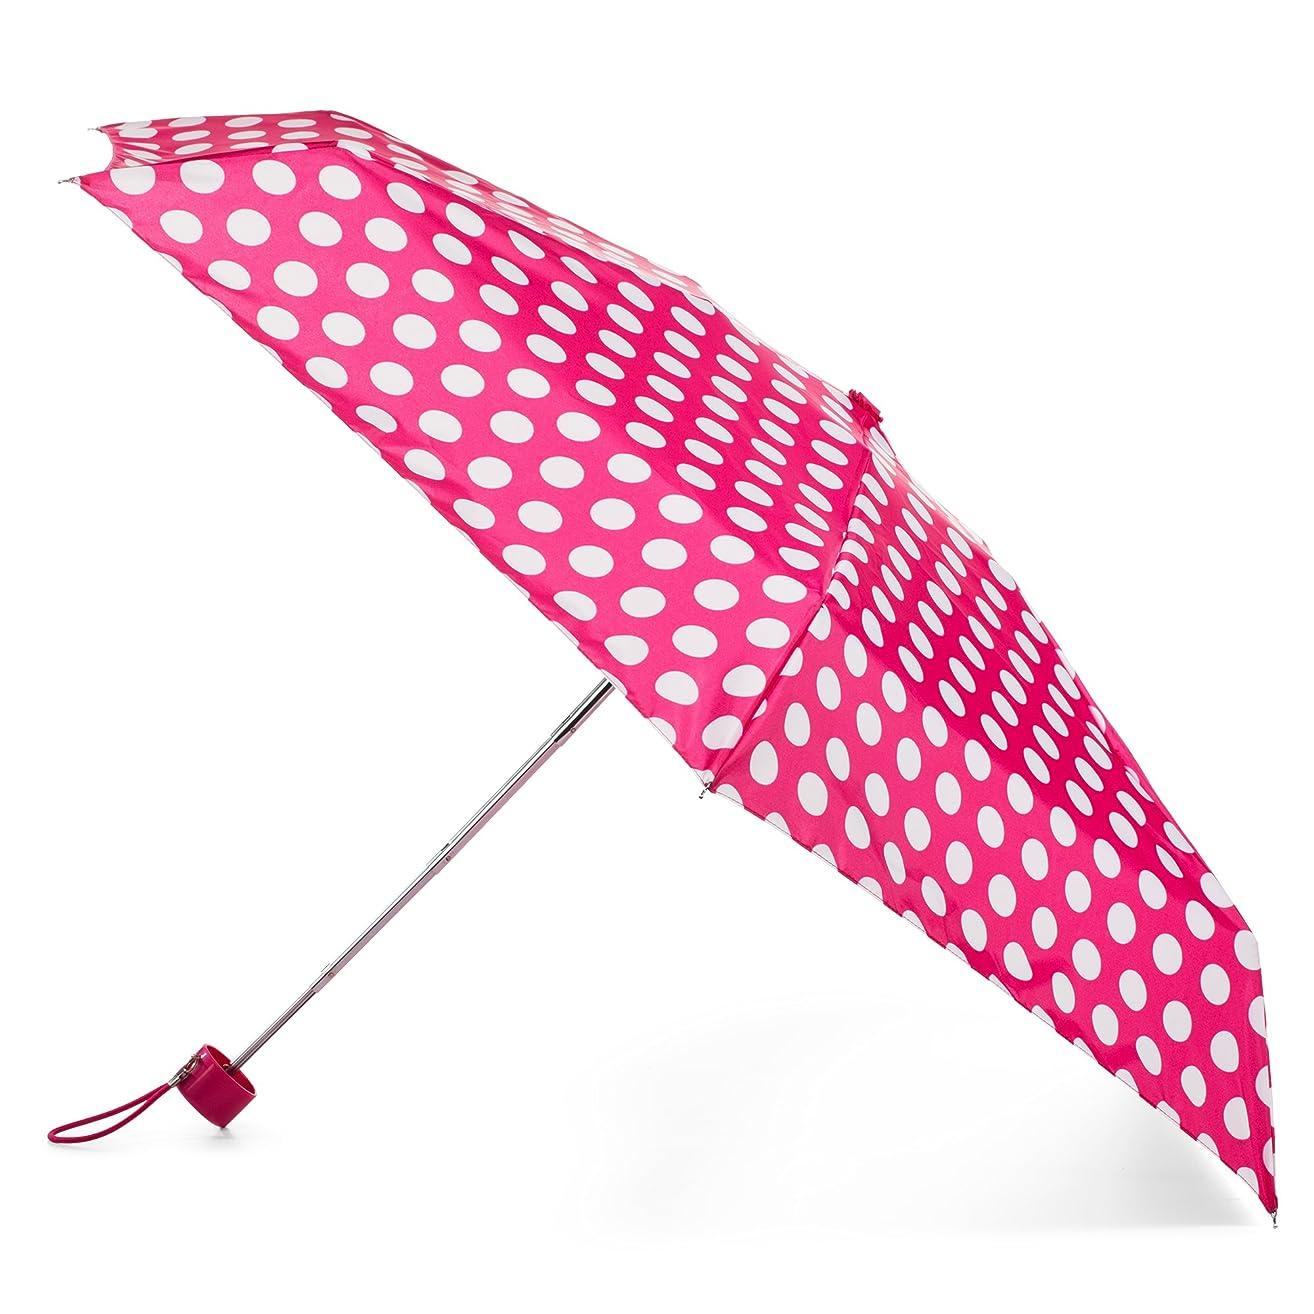 totes Compact Travel Foldable Water-Resistant Umbrella, Pink Polka